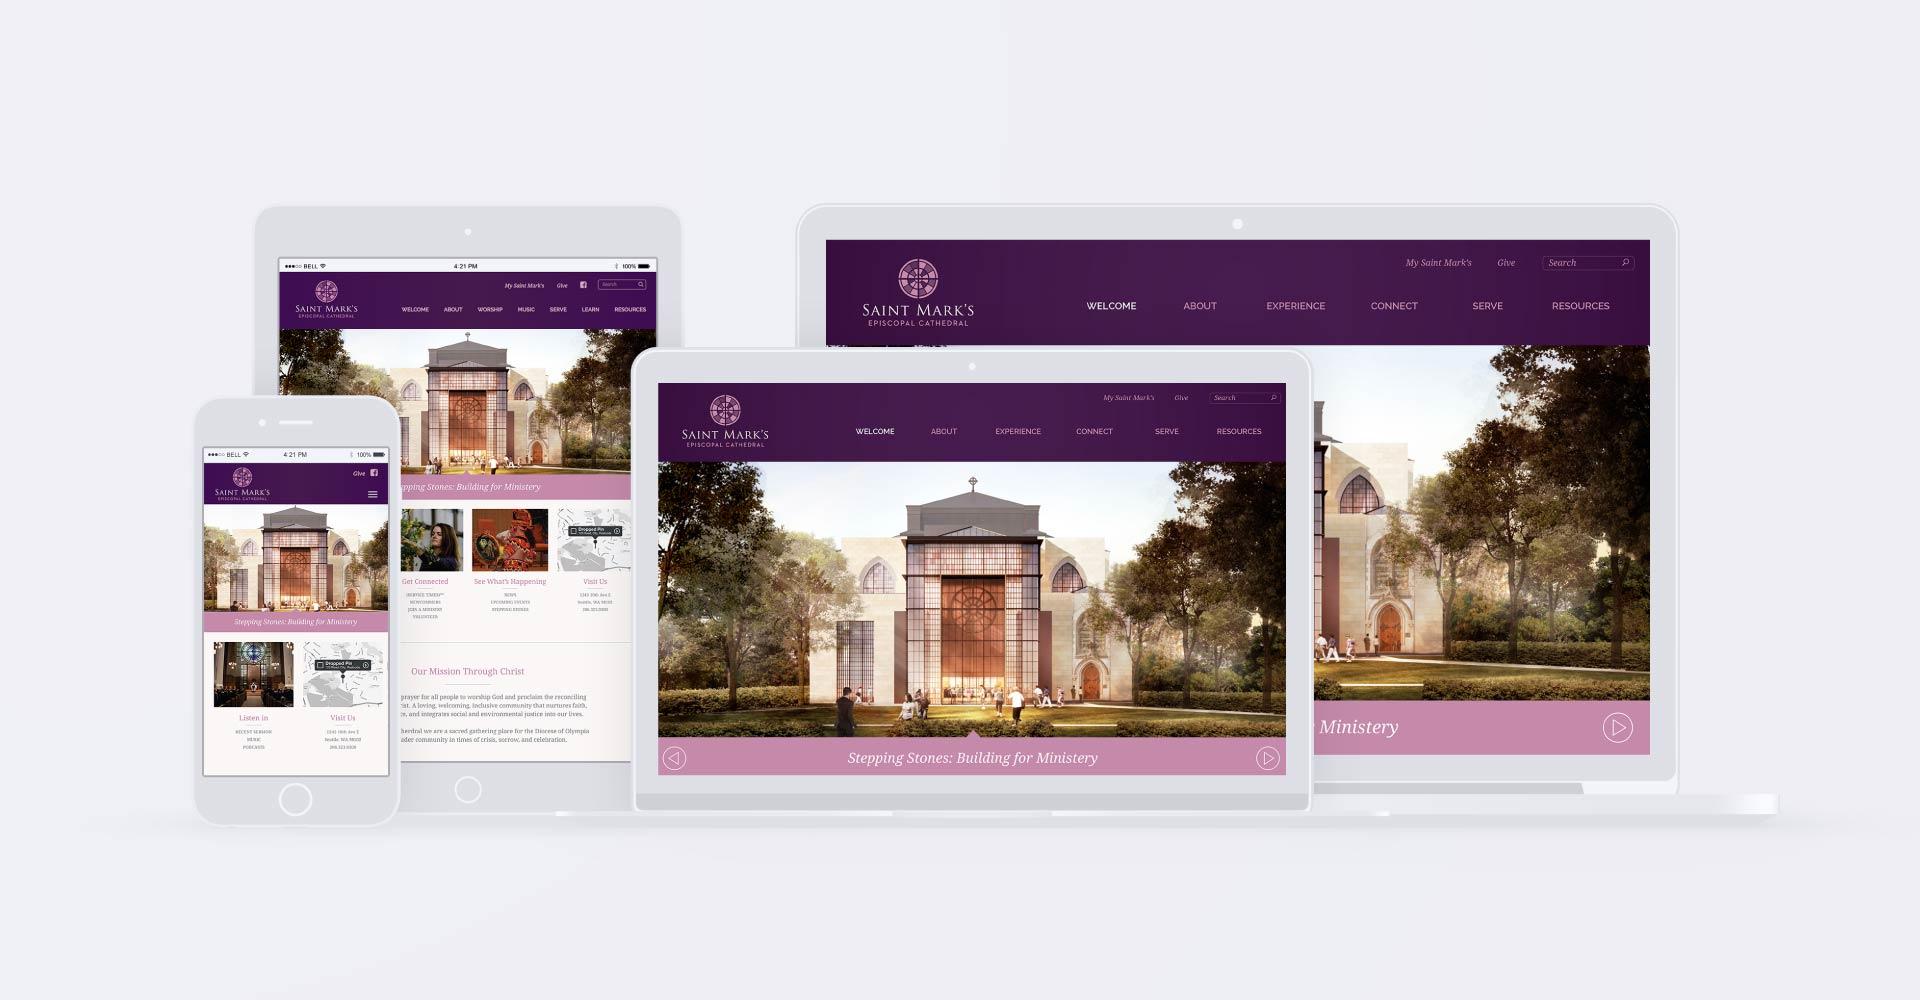 Creative_Retail_Packaging_Saint_Marks_Episcopal_Cathedral_Branding_Identity_11.jpg